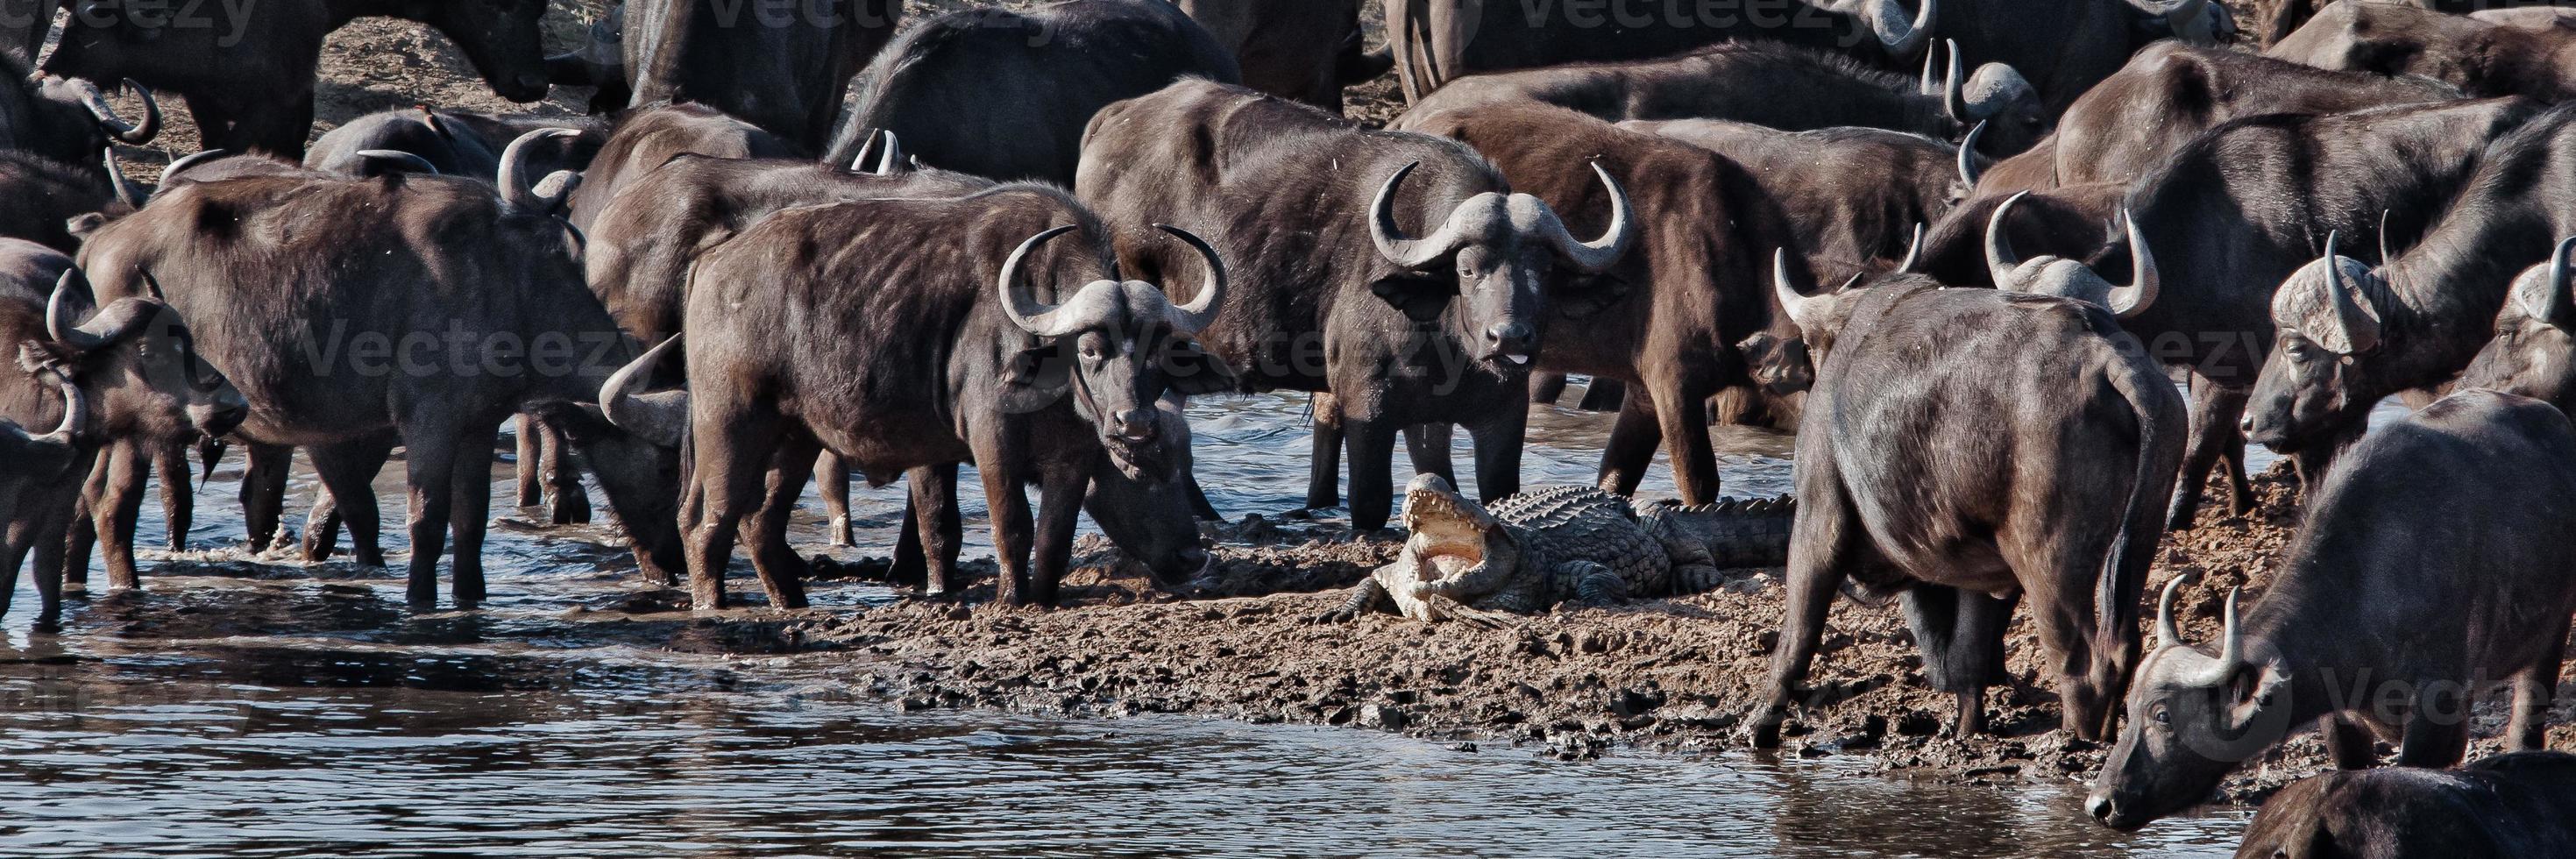 buffels versus krokodil foto